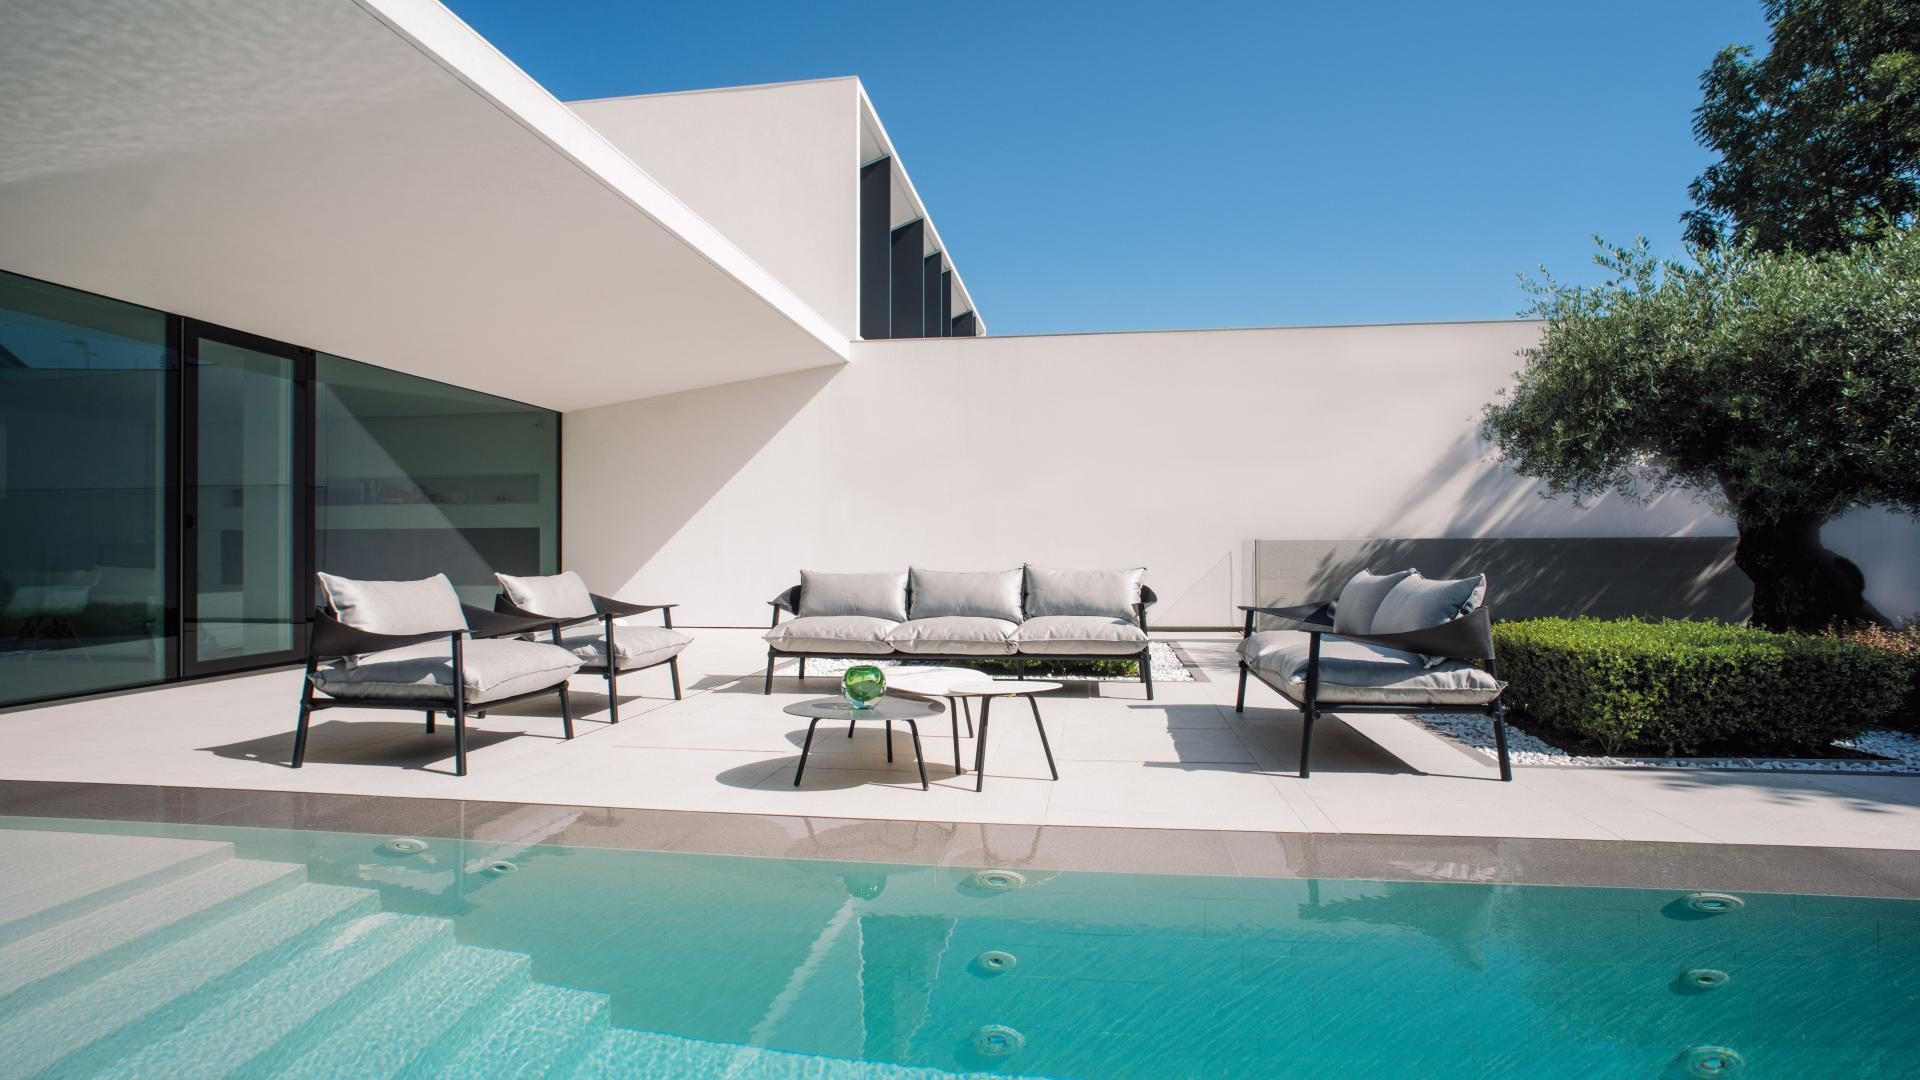 Outdoor lounge aluminium Terramare 2-zit buitensalon 3-zit - antraciet - Emu